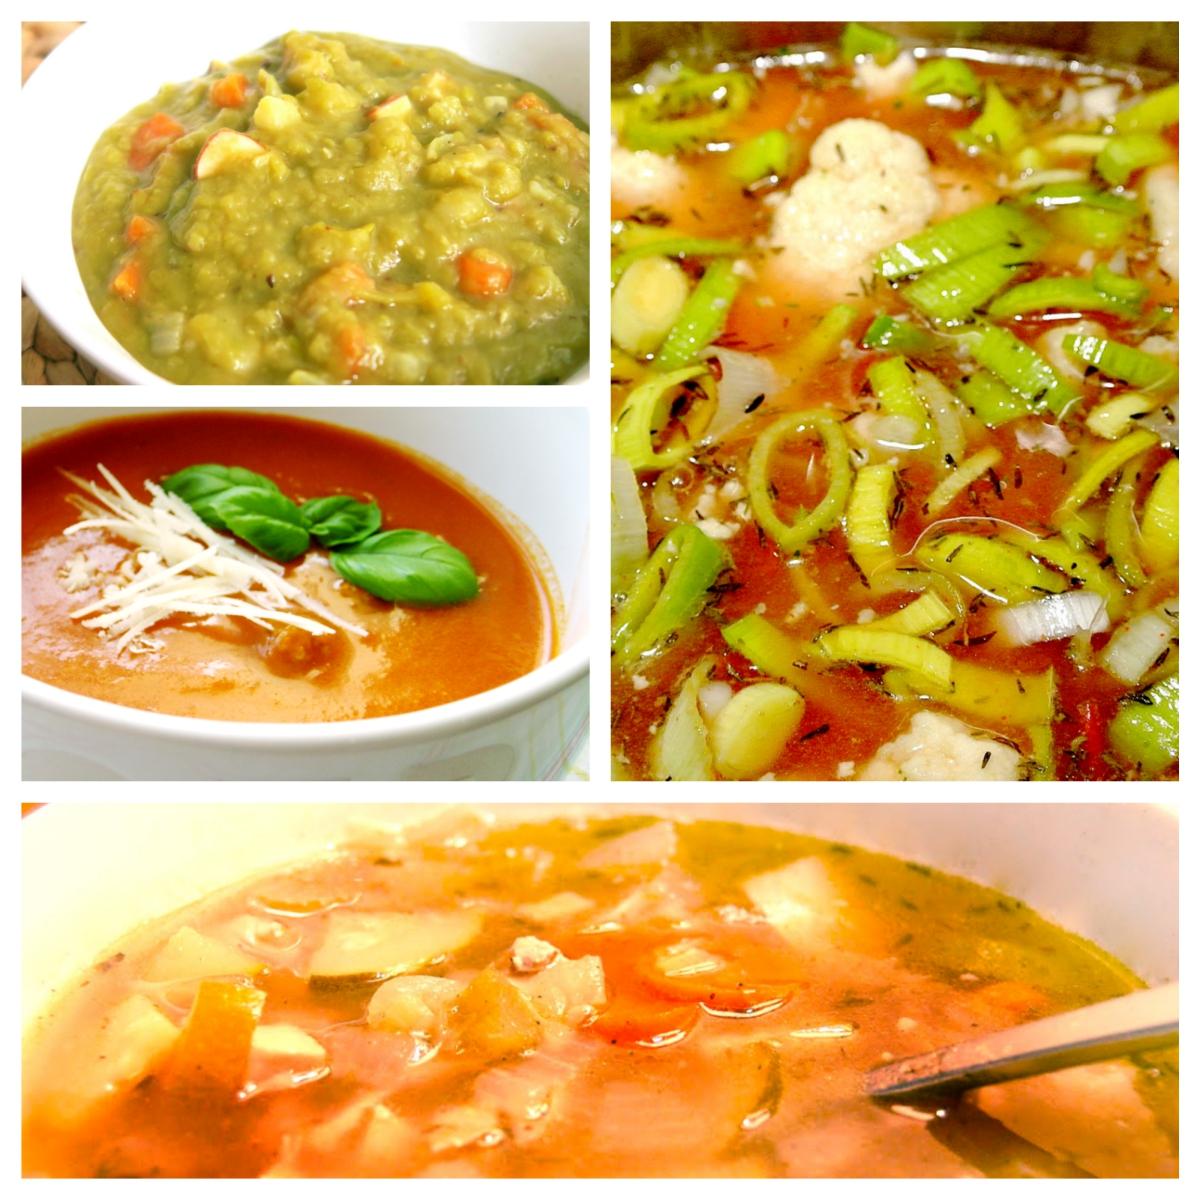 Welke wijn past bij welke soep. welke wijn drink je bij groentesoep, tomatensoep, kippensoep, erwtensoep